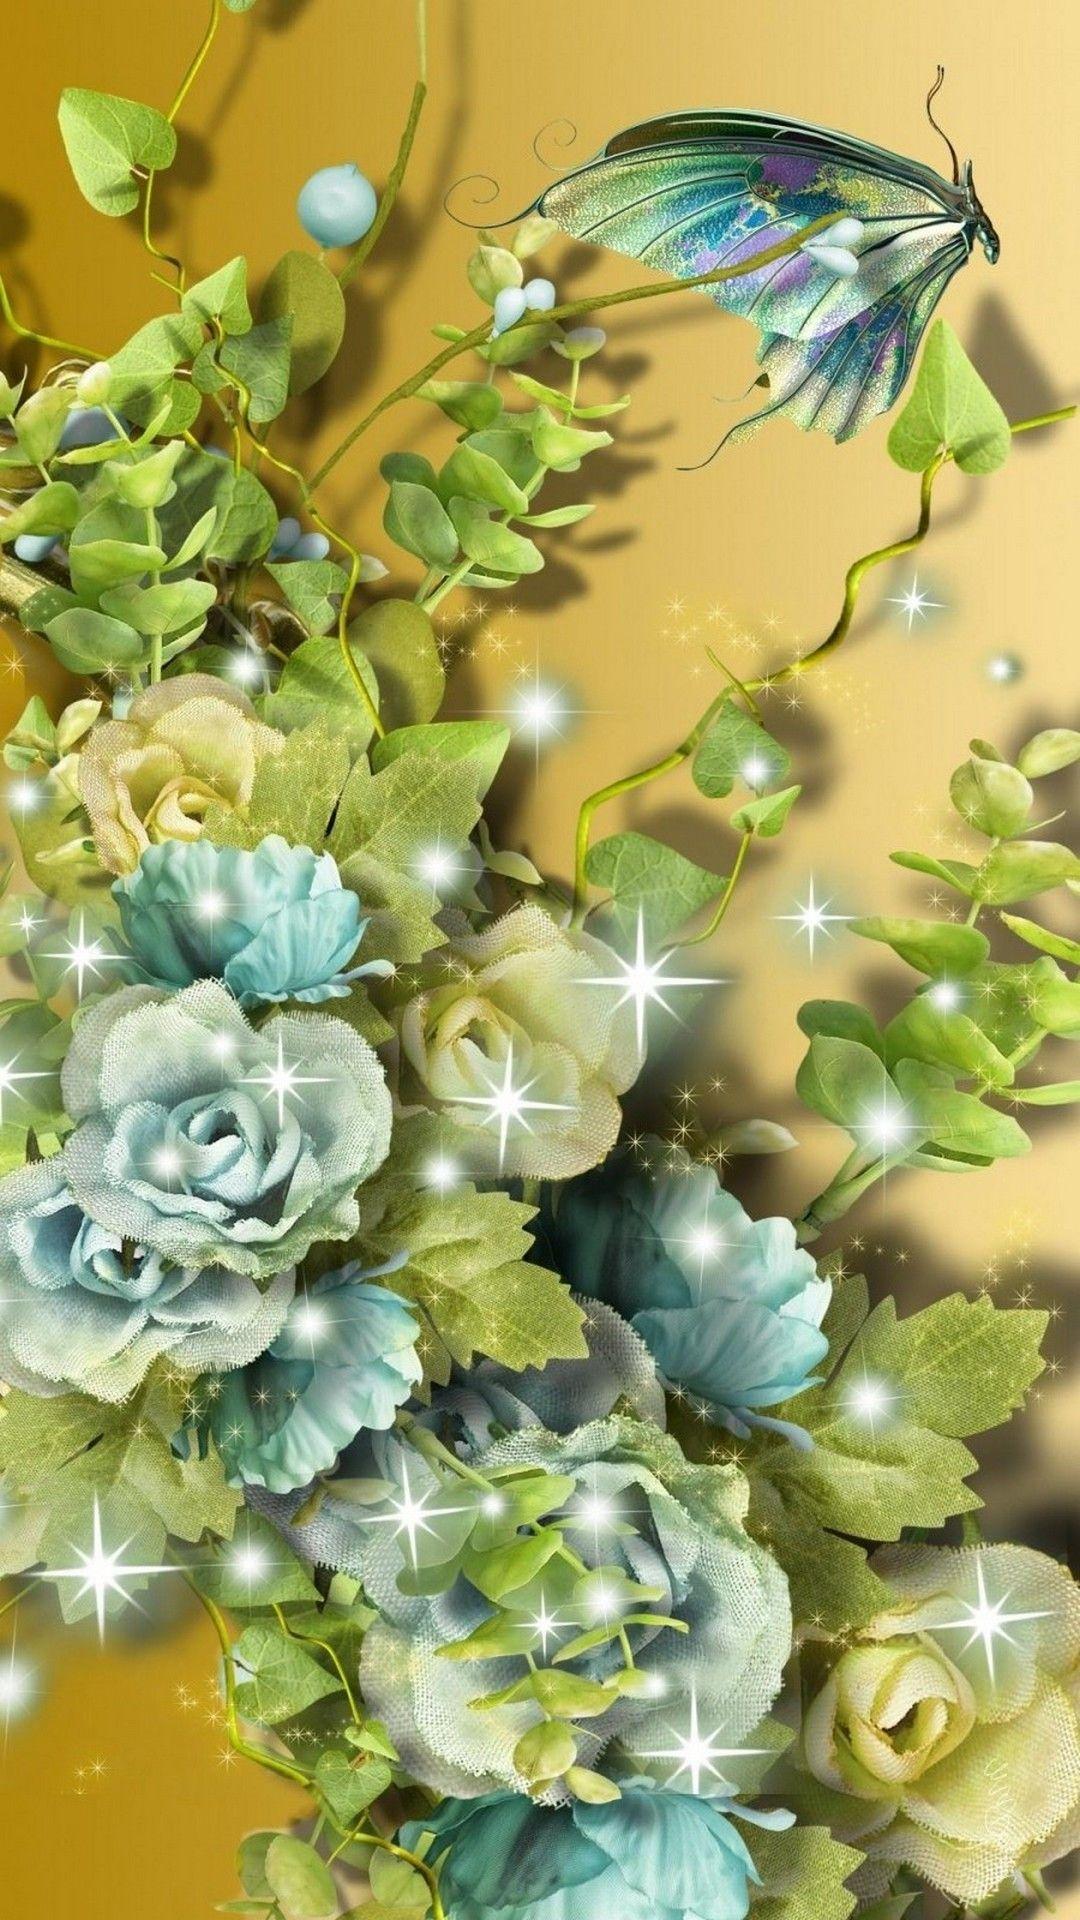 3d Flower Cellphone Wallpaper With Images Flower Wallpaper